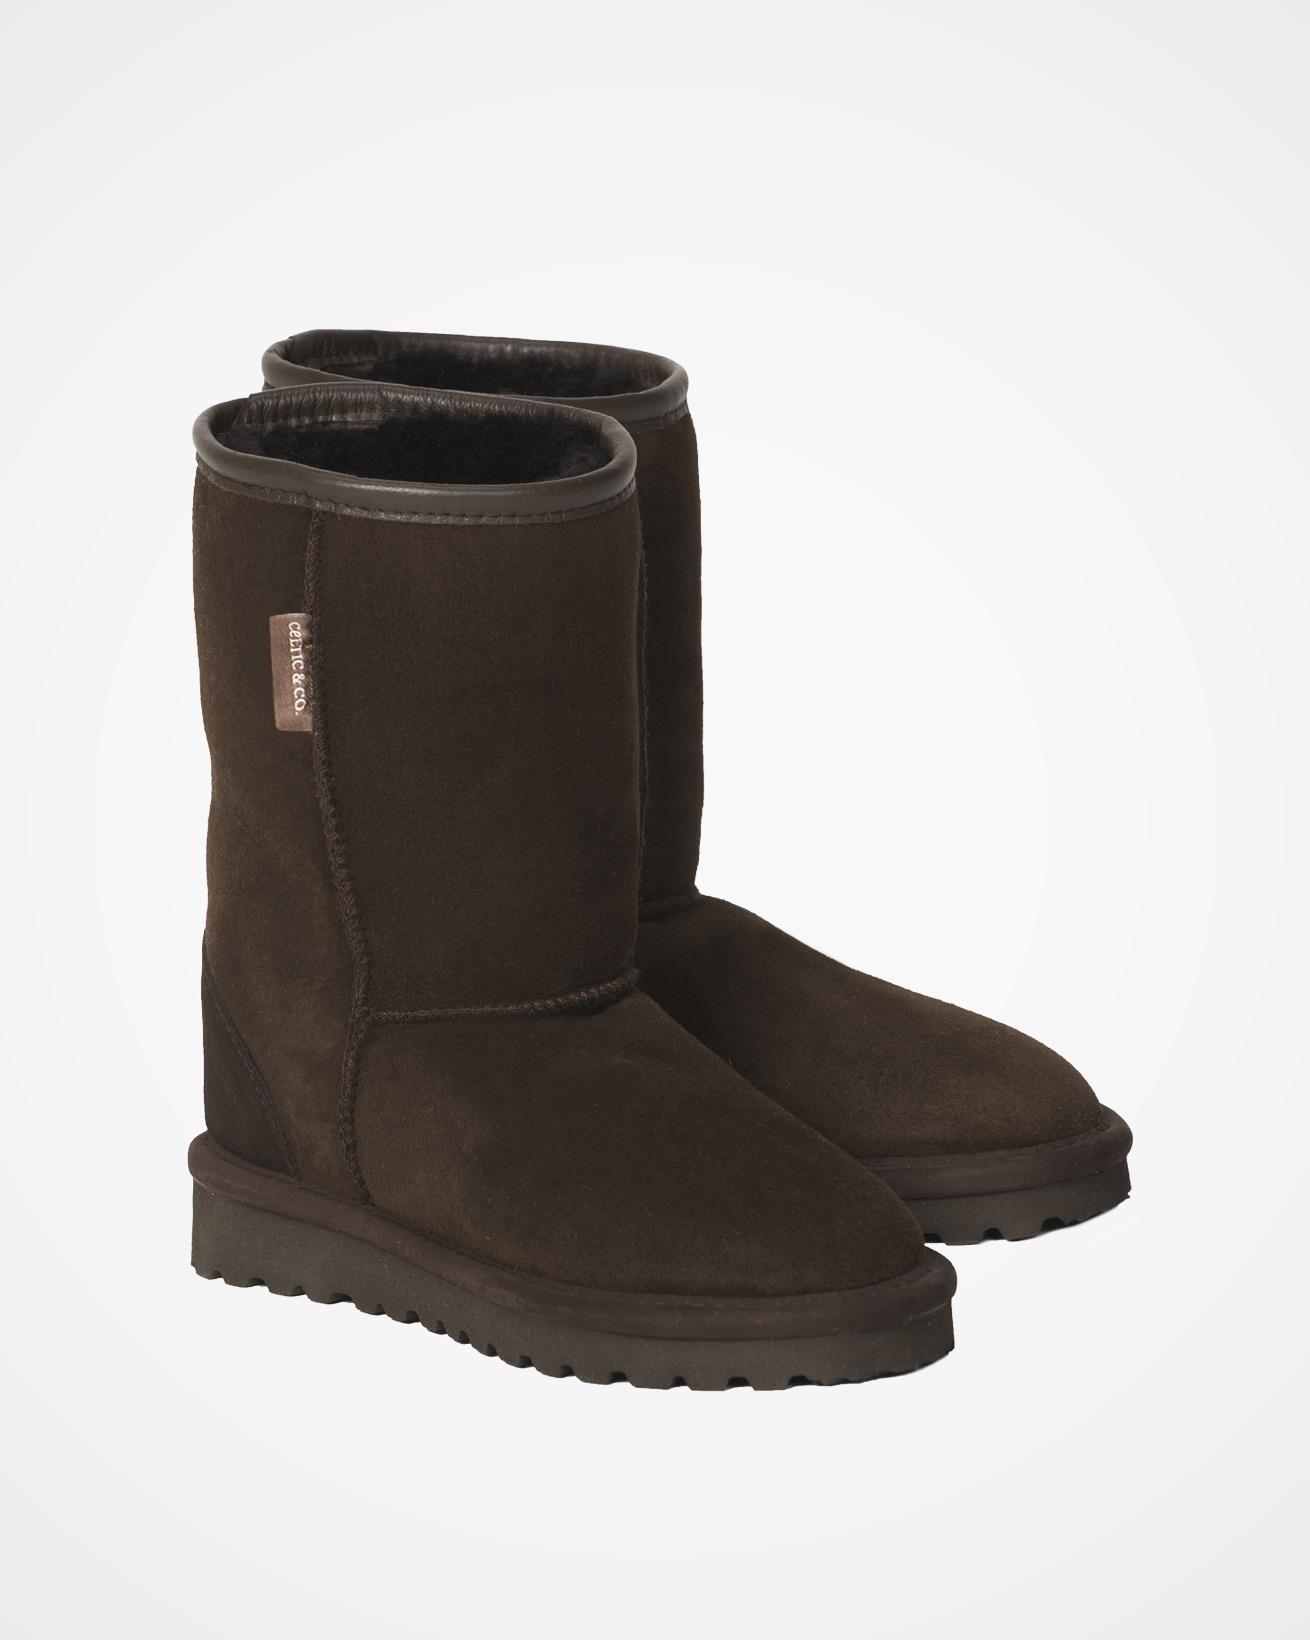 5894_classic-sheepskin-boots-regular_mocca_pair.jpg